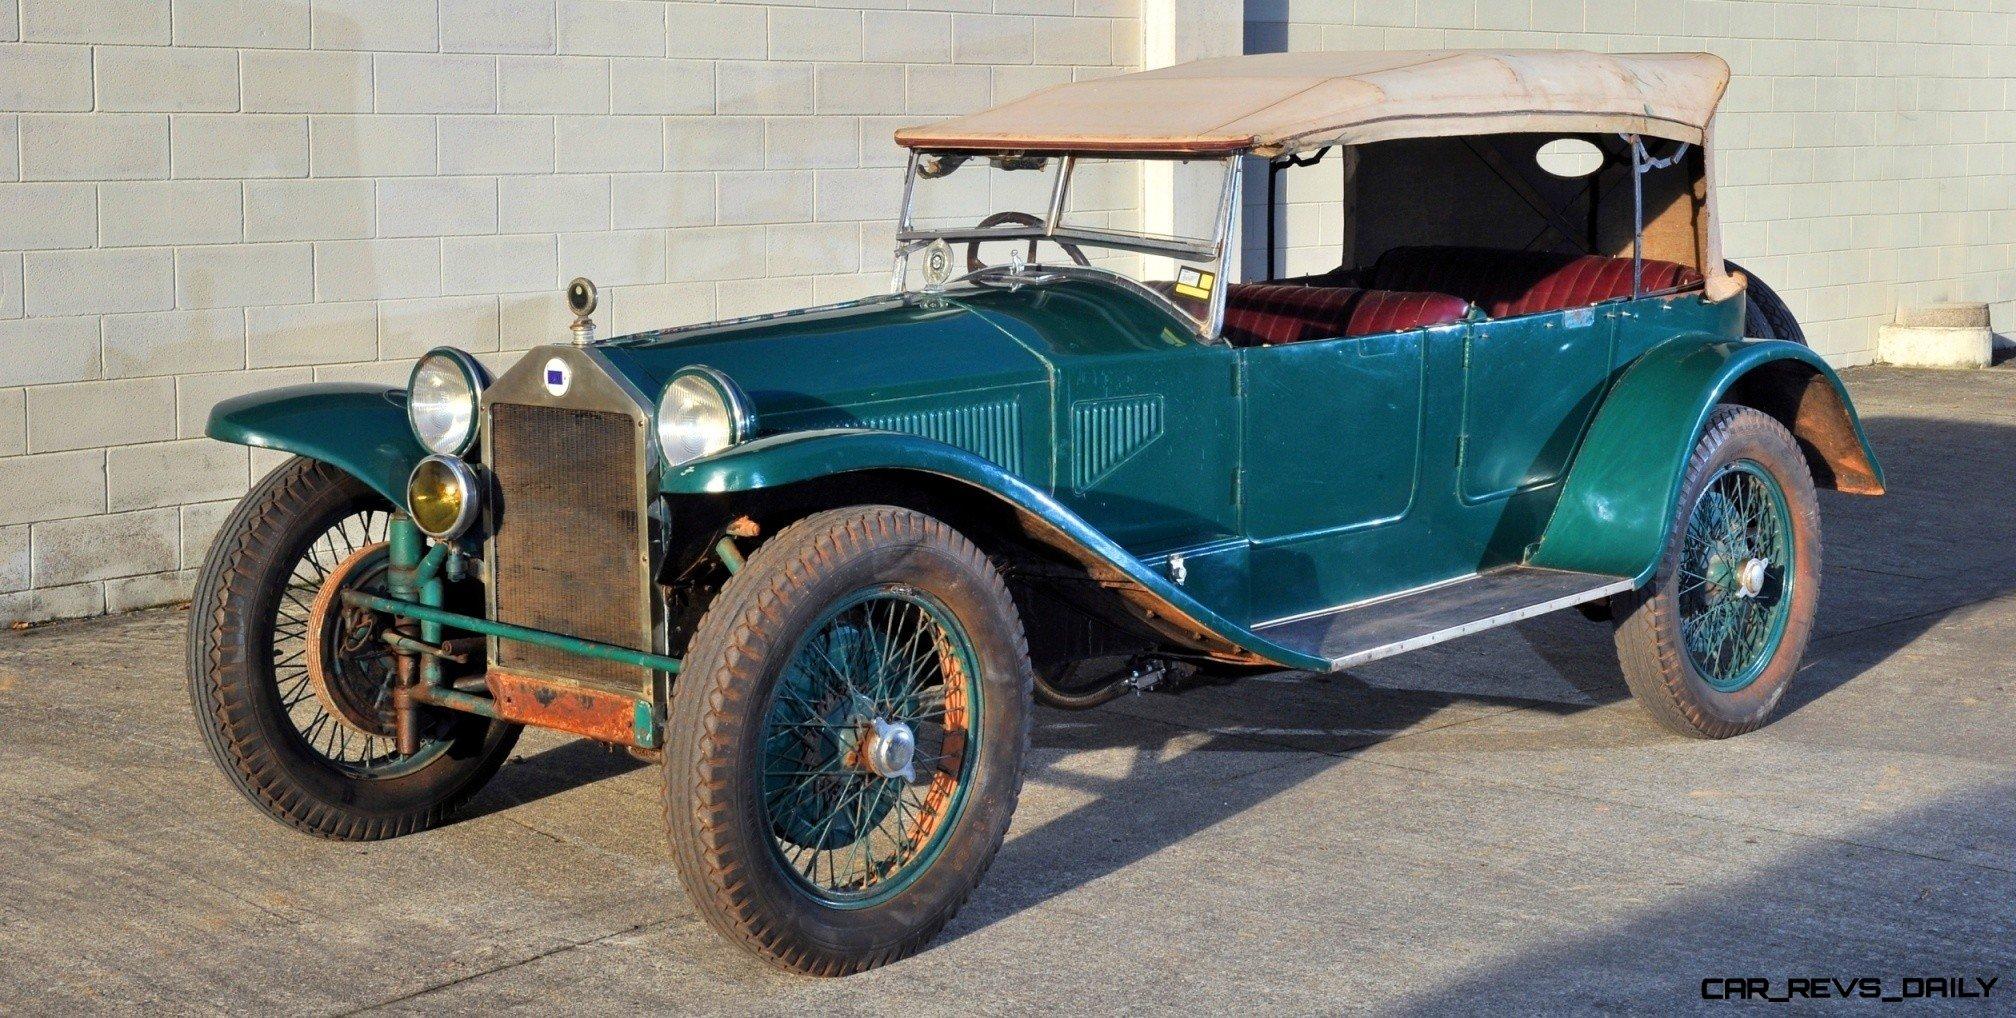 http://www.car-revs-daily.com/wp-content/uploads/2014/02/Wealth-Dreams-1930-Lancia-Lambda-8-Sports-Tourer-Seeks-New-Home-My-Home-1.jpg